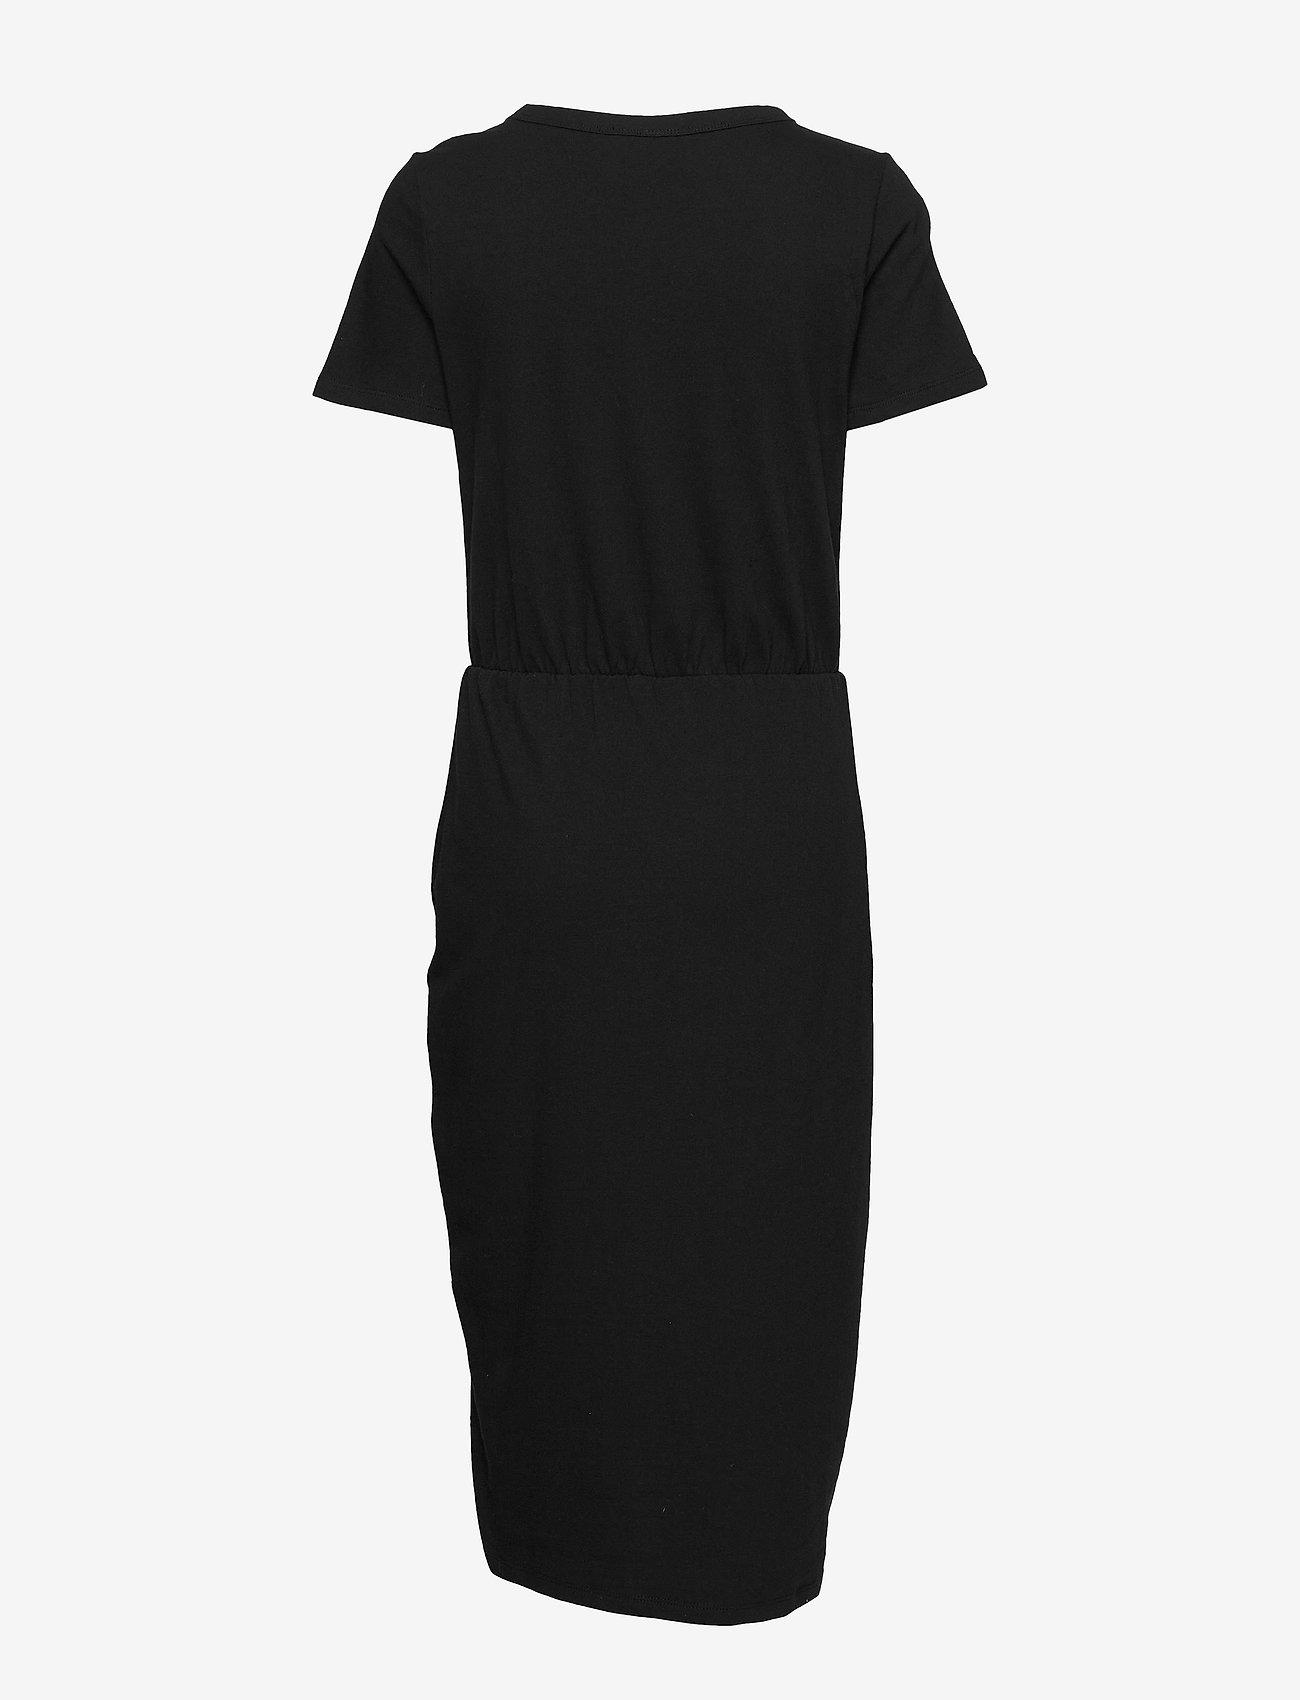 Short Sleeve Ruched Midi Dress (True Black V2 2) - GAP uejBF3